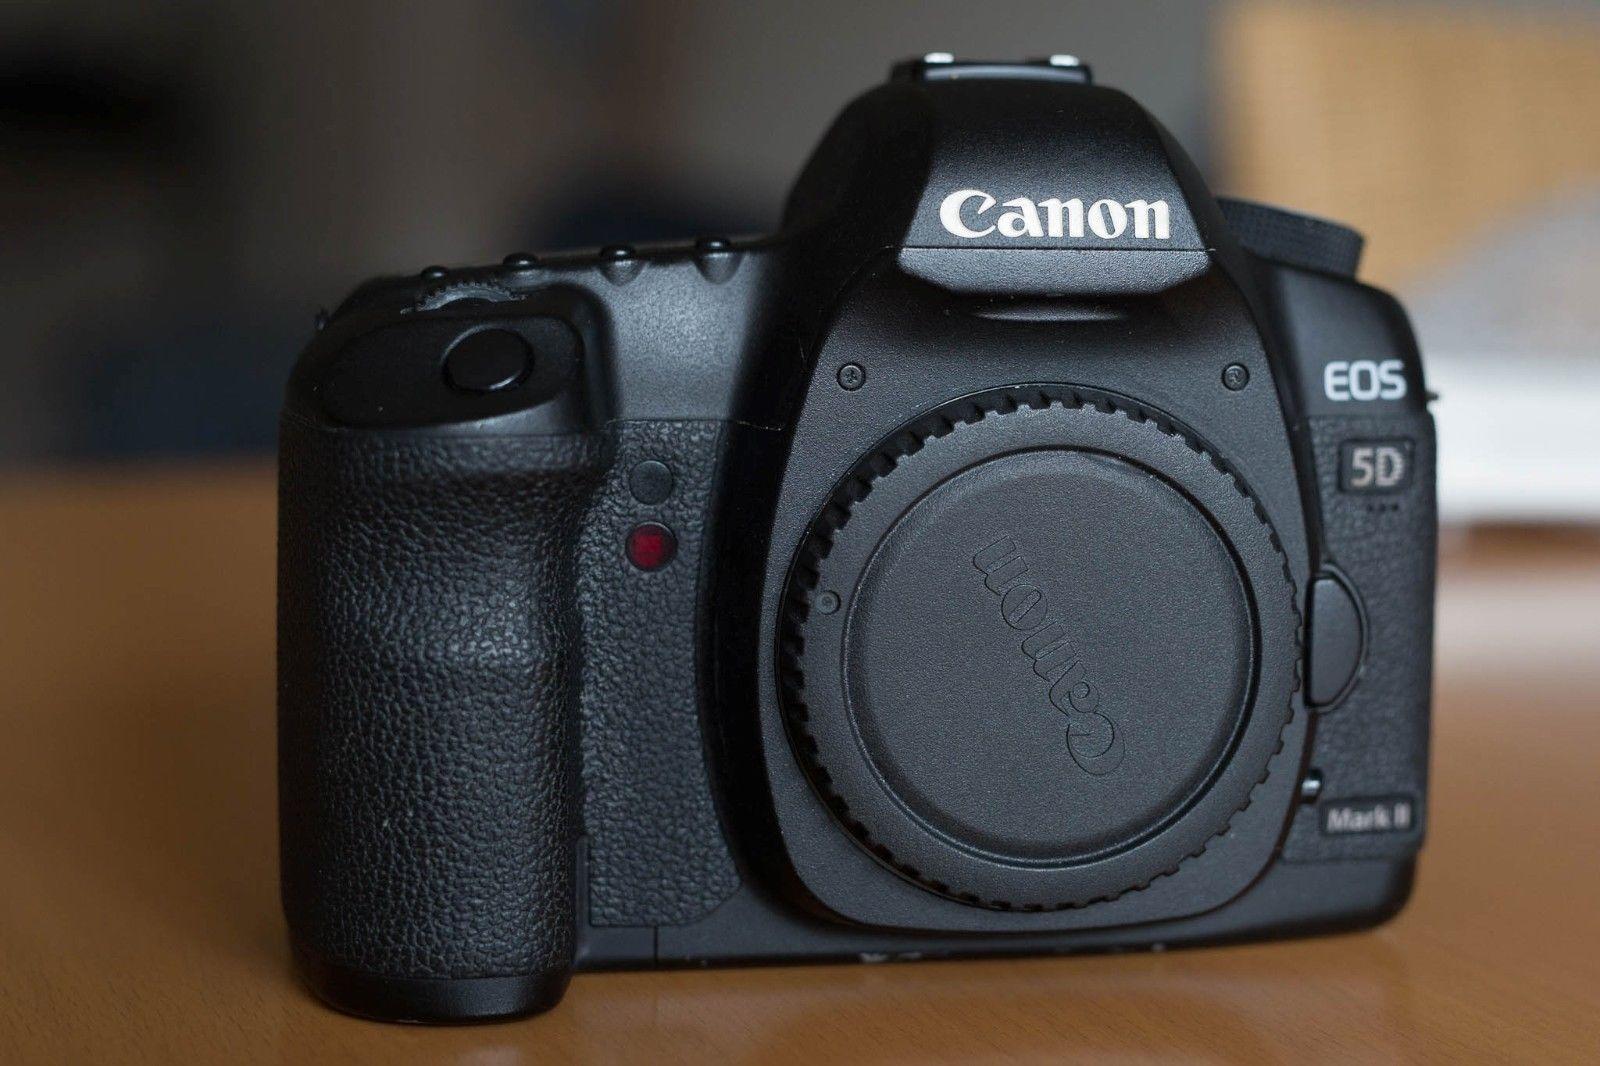 Canon EOS 5D Mark II 21.1 MP SLR-Digitalkamera - Schwarz (Nur Gehäuse)